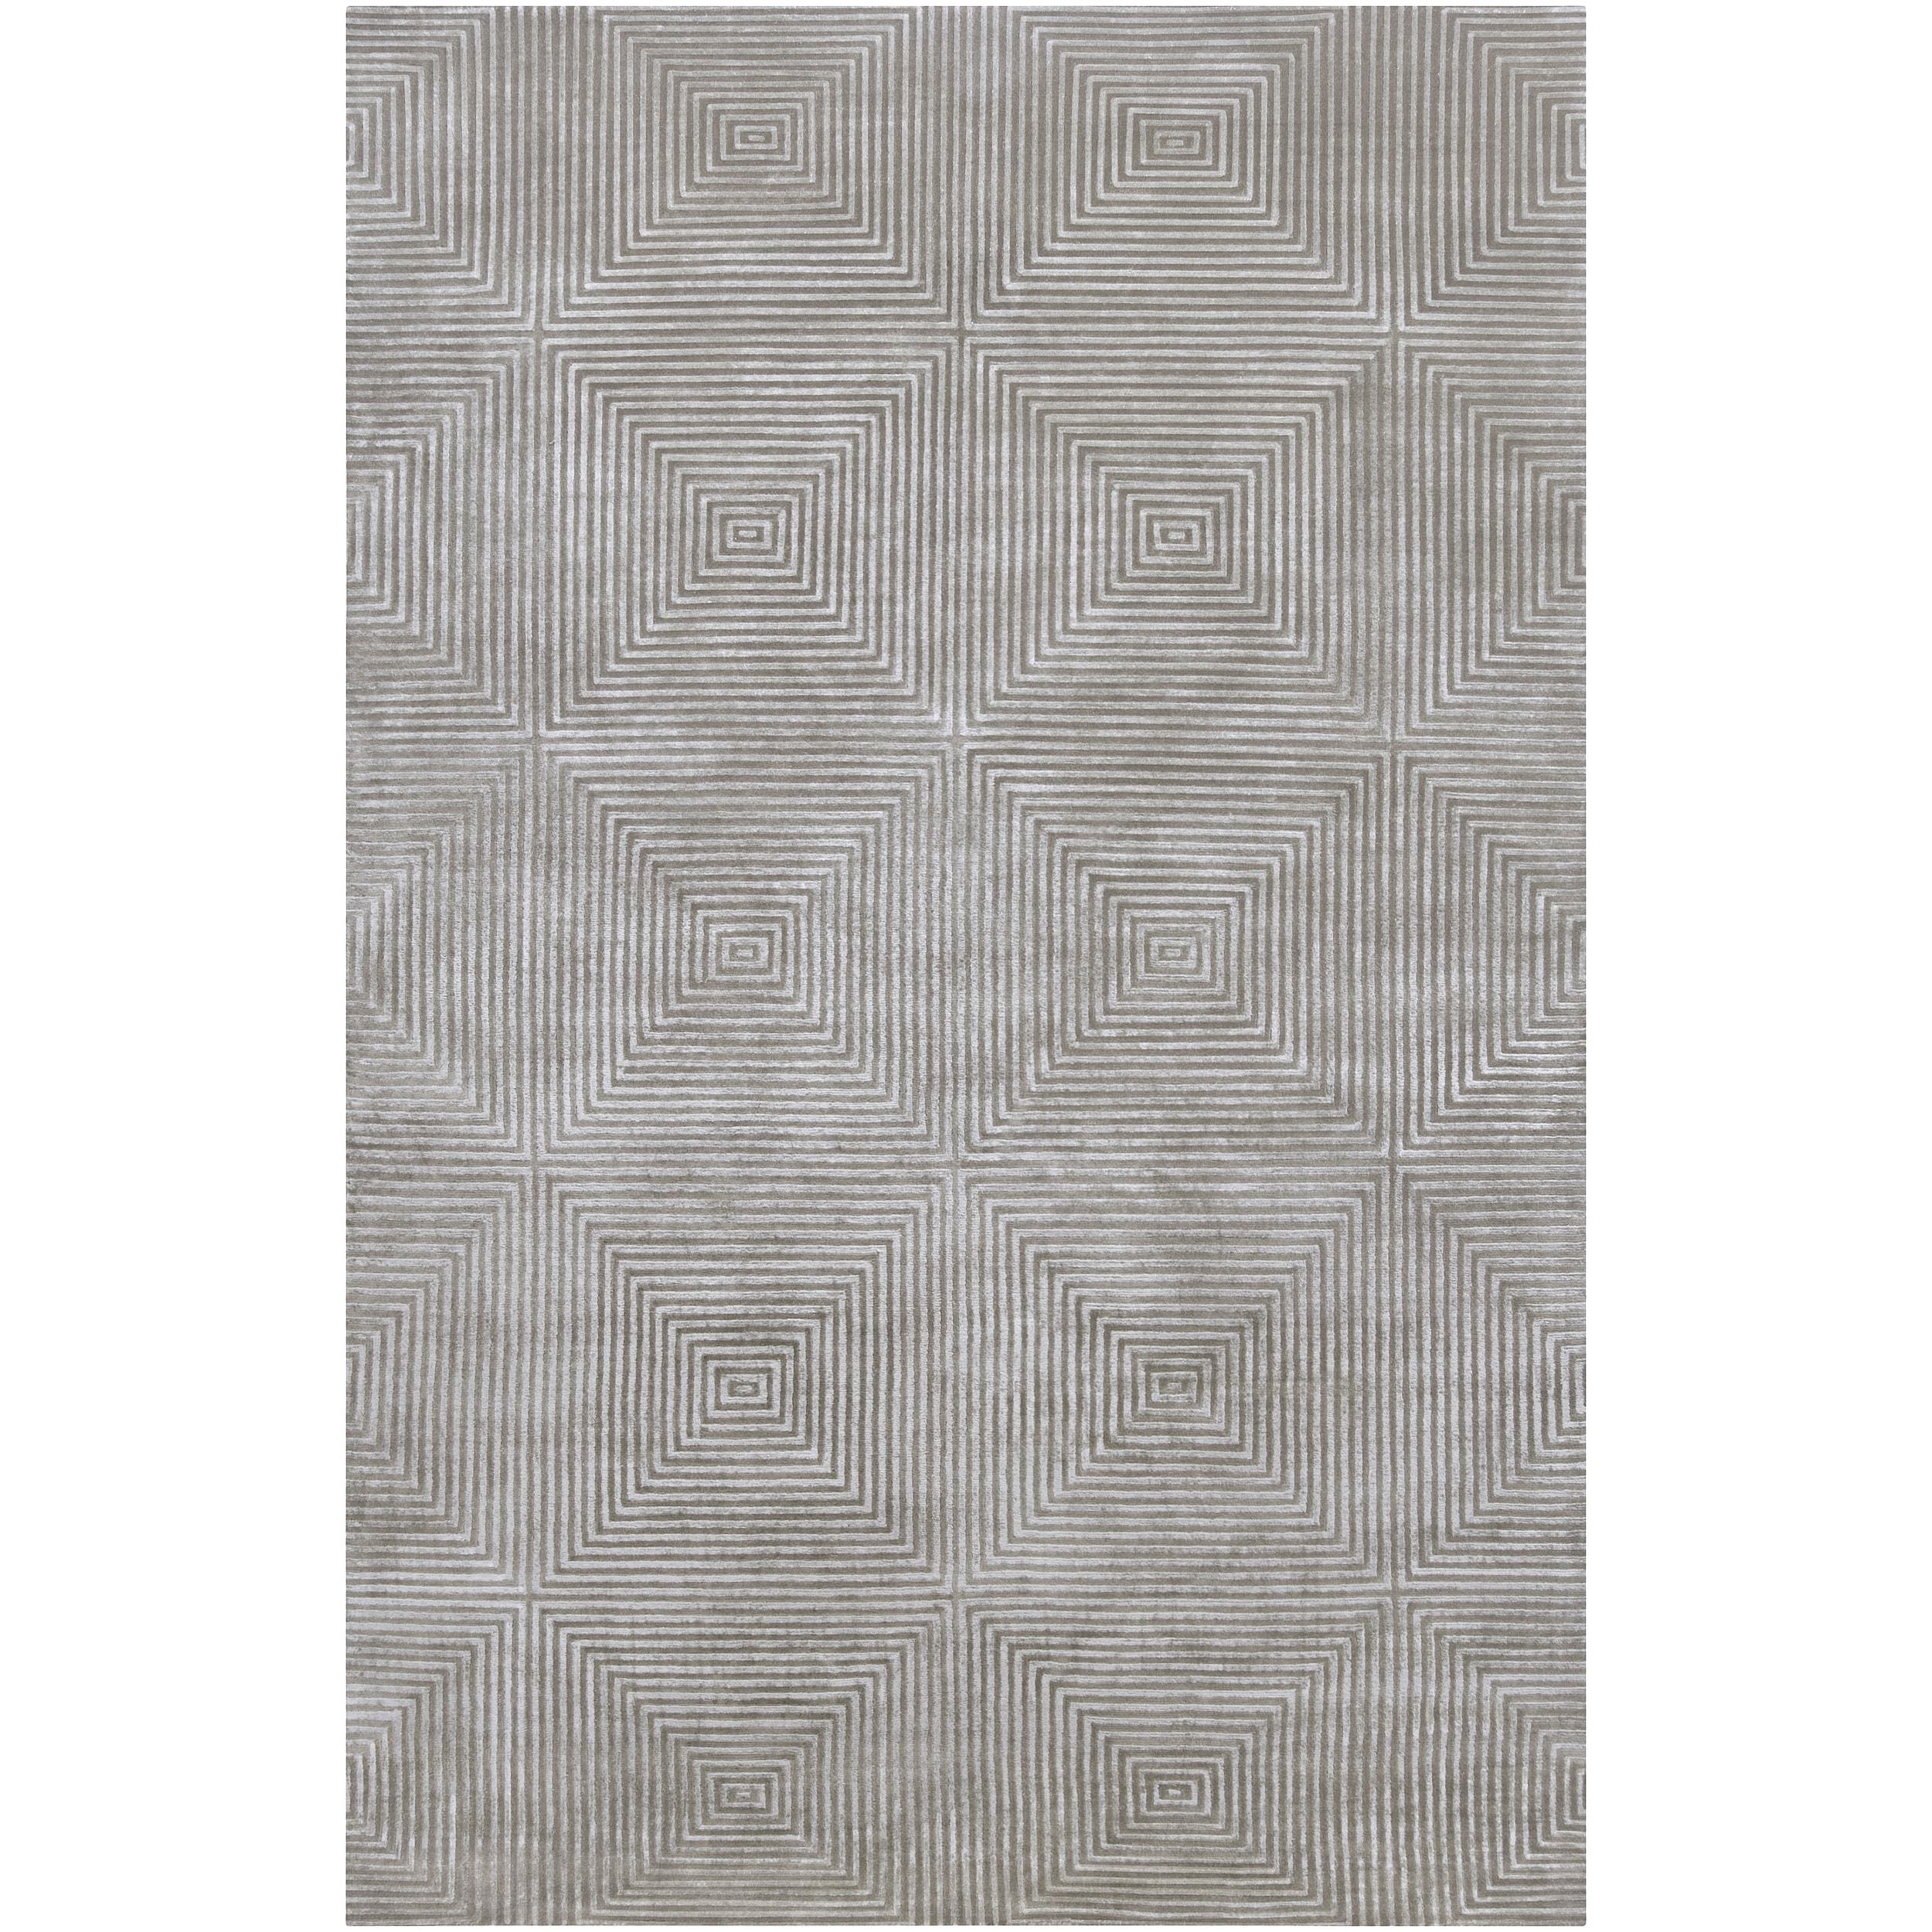 Hand-knotted Gray Apeiro Geometric Wool Rug (8' x 11')